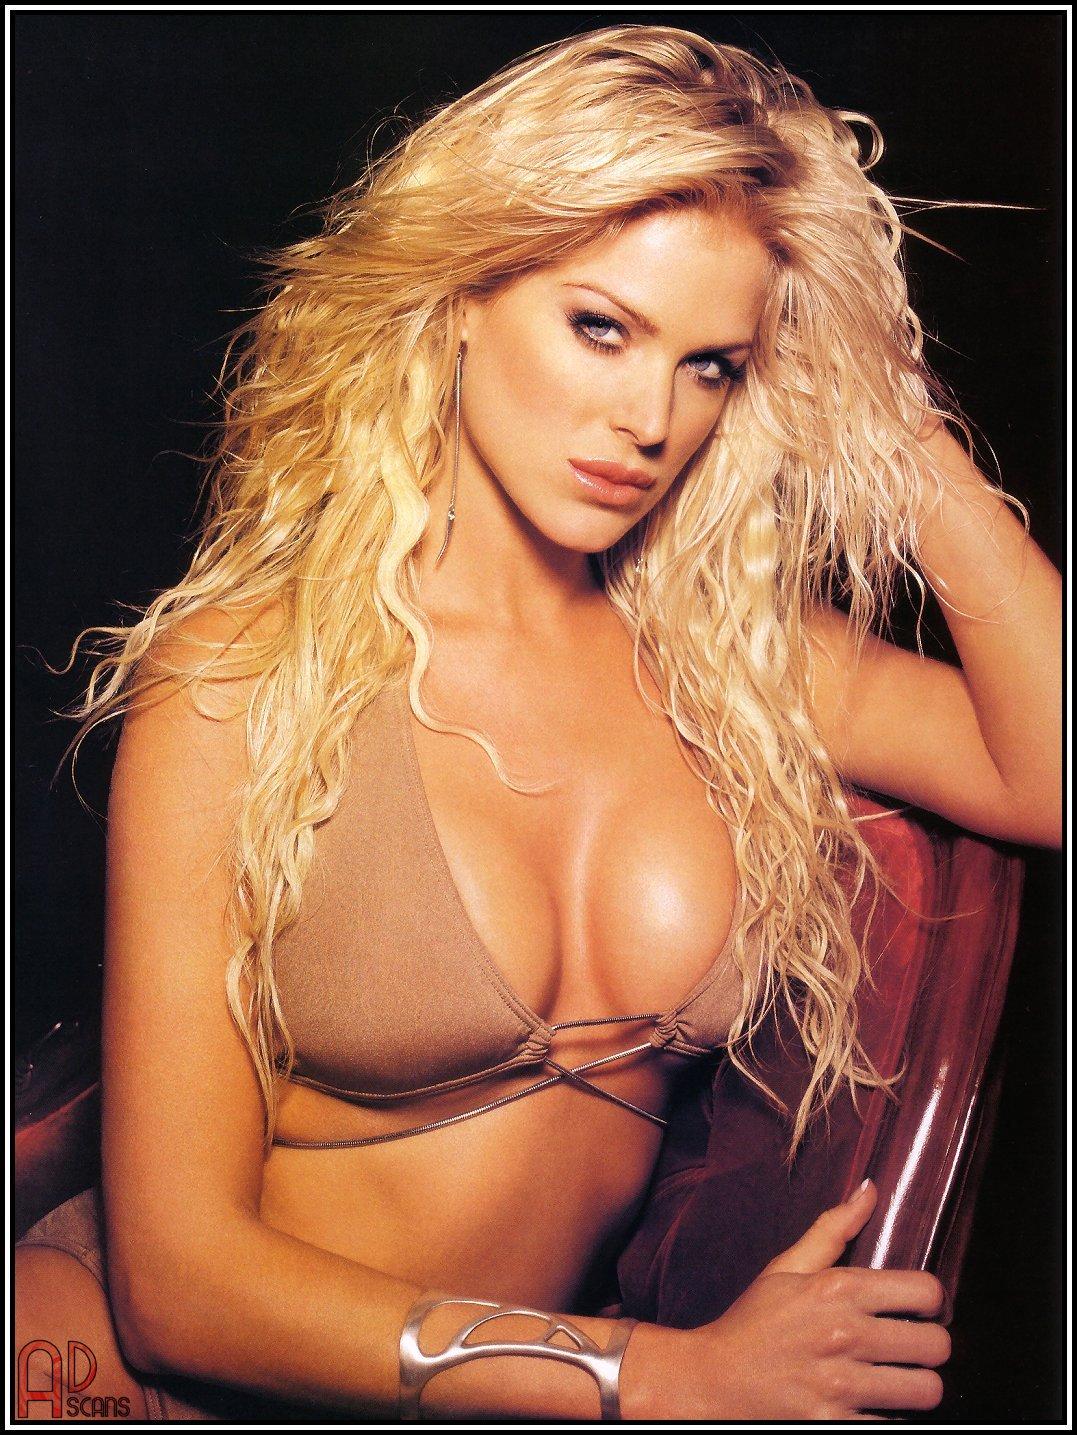 Hot girl erotic breasts